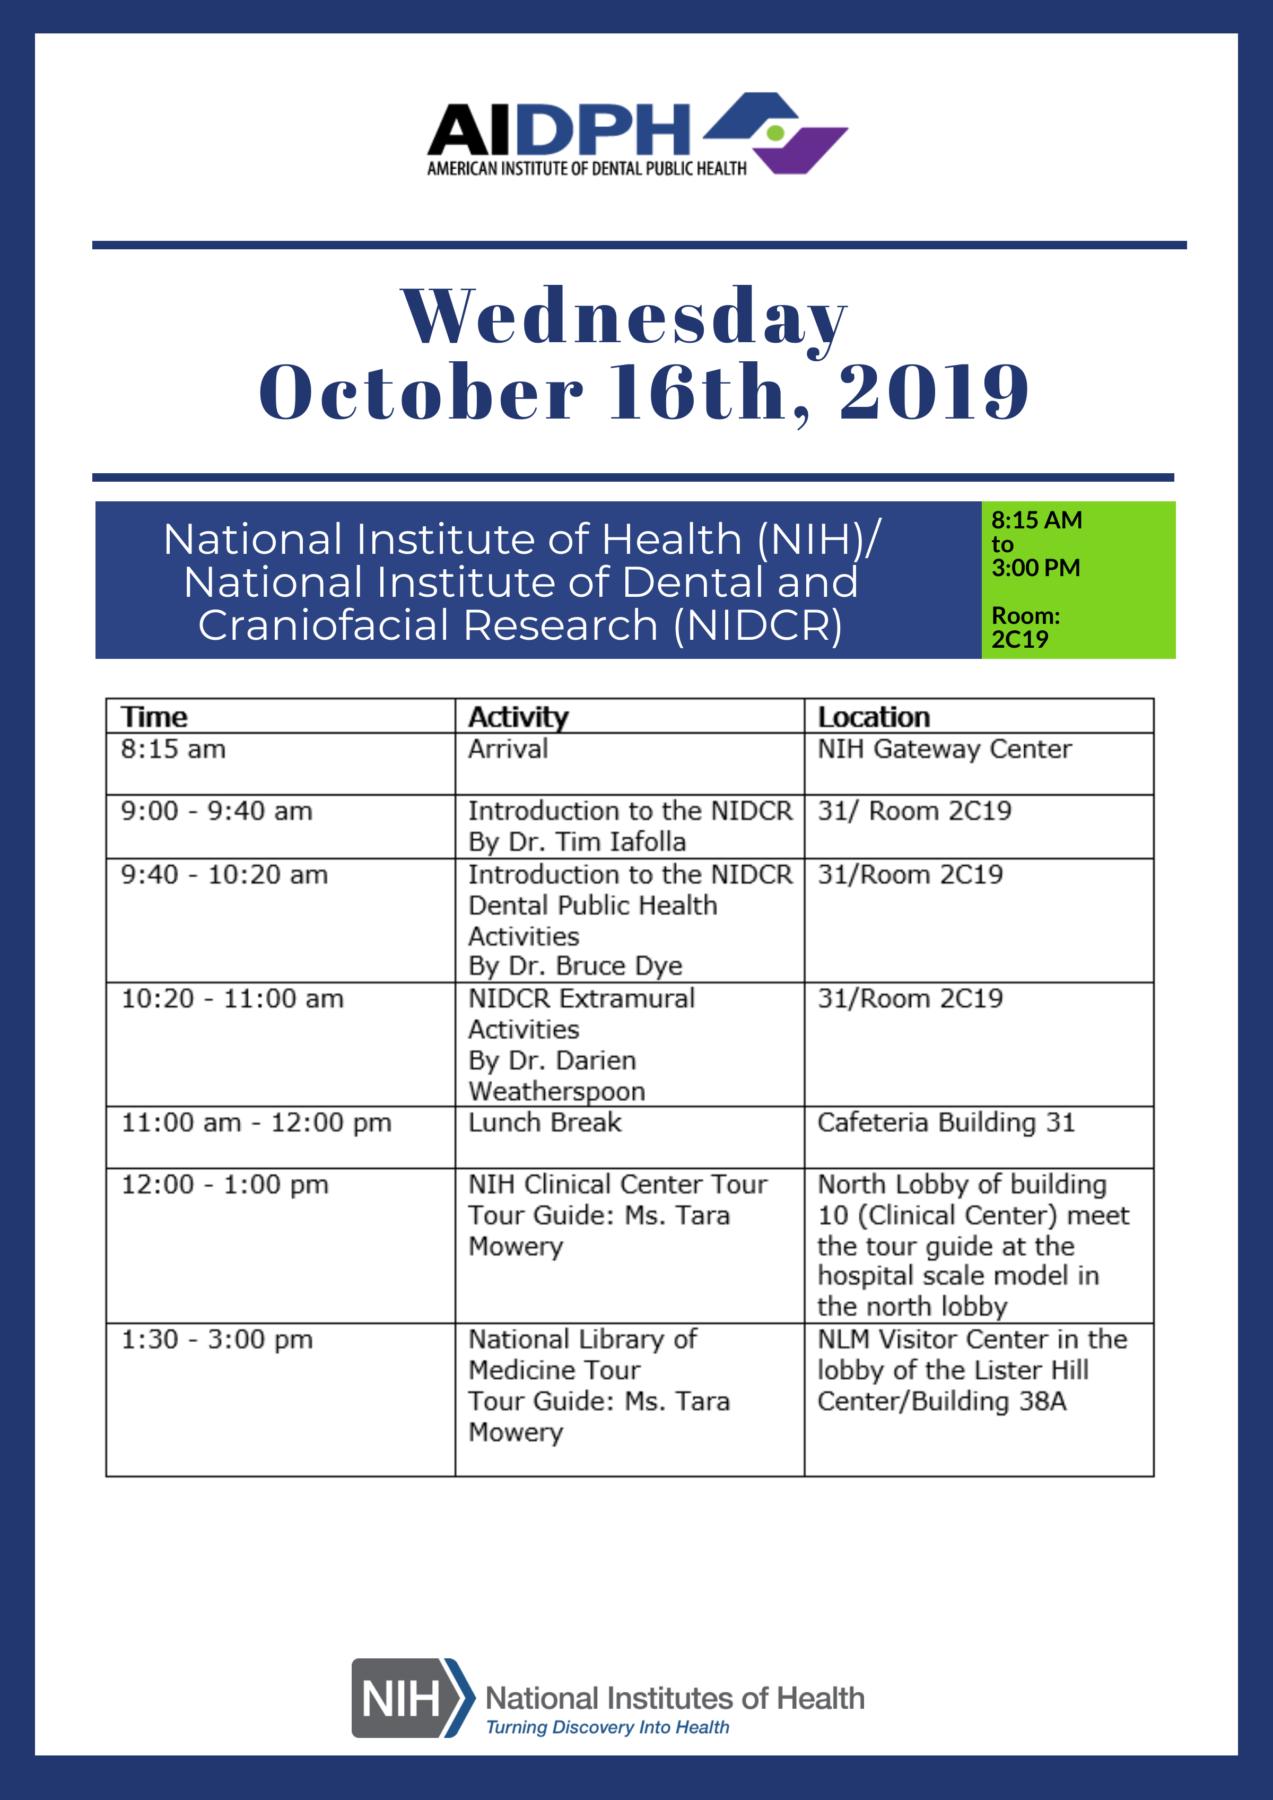 Day Two: NIH, NLM